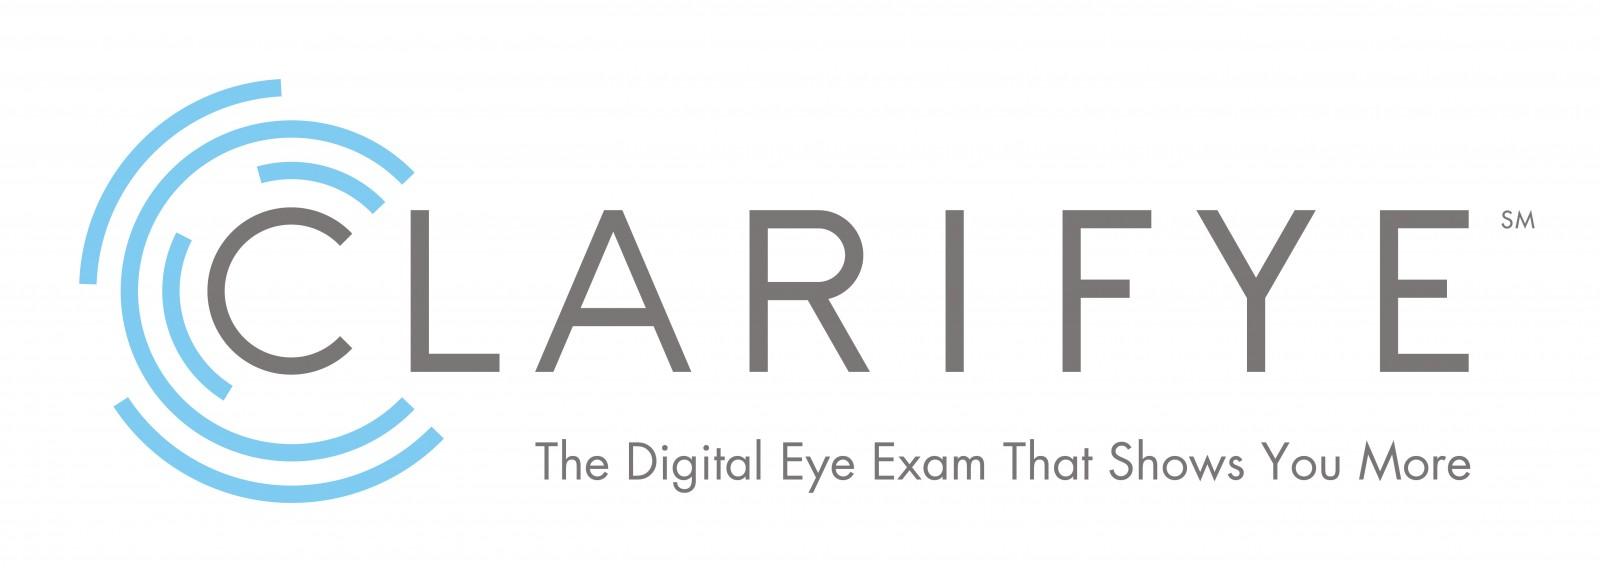 clarifye logo jpg